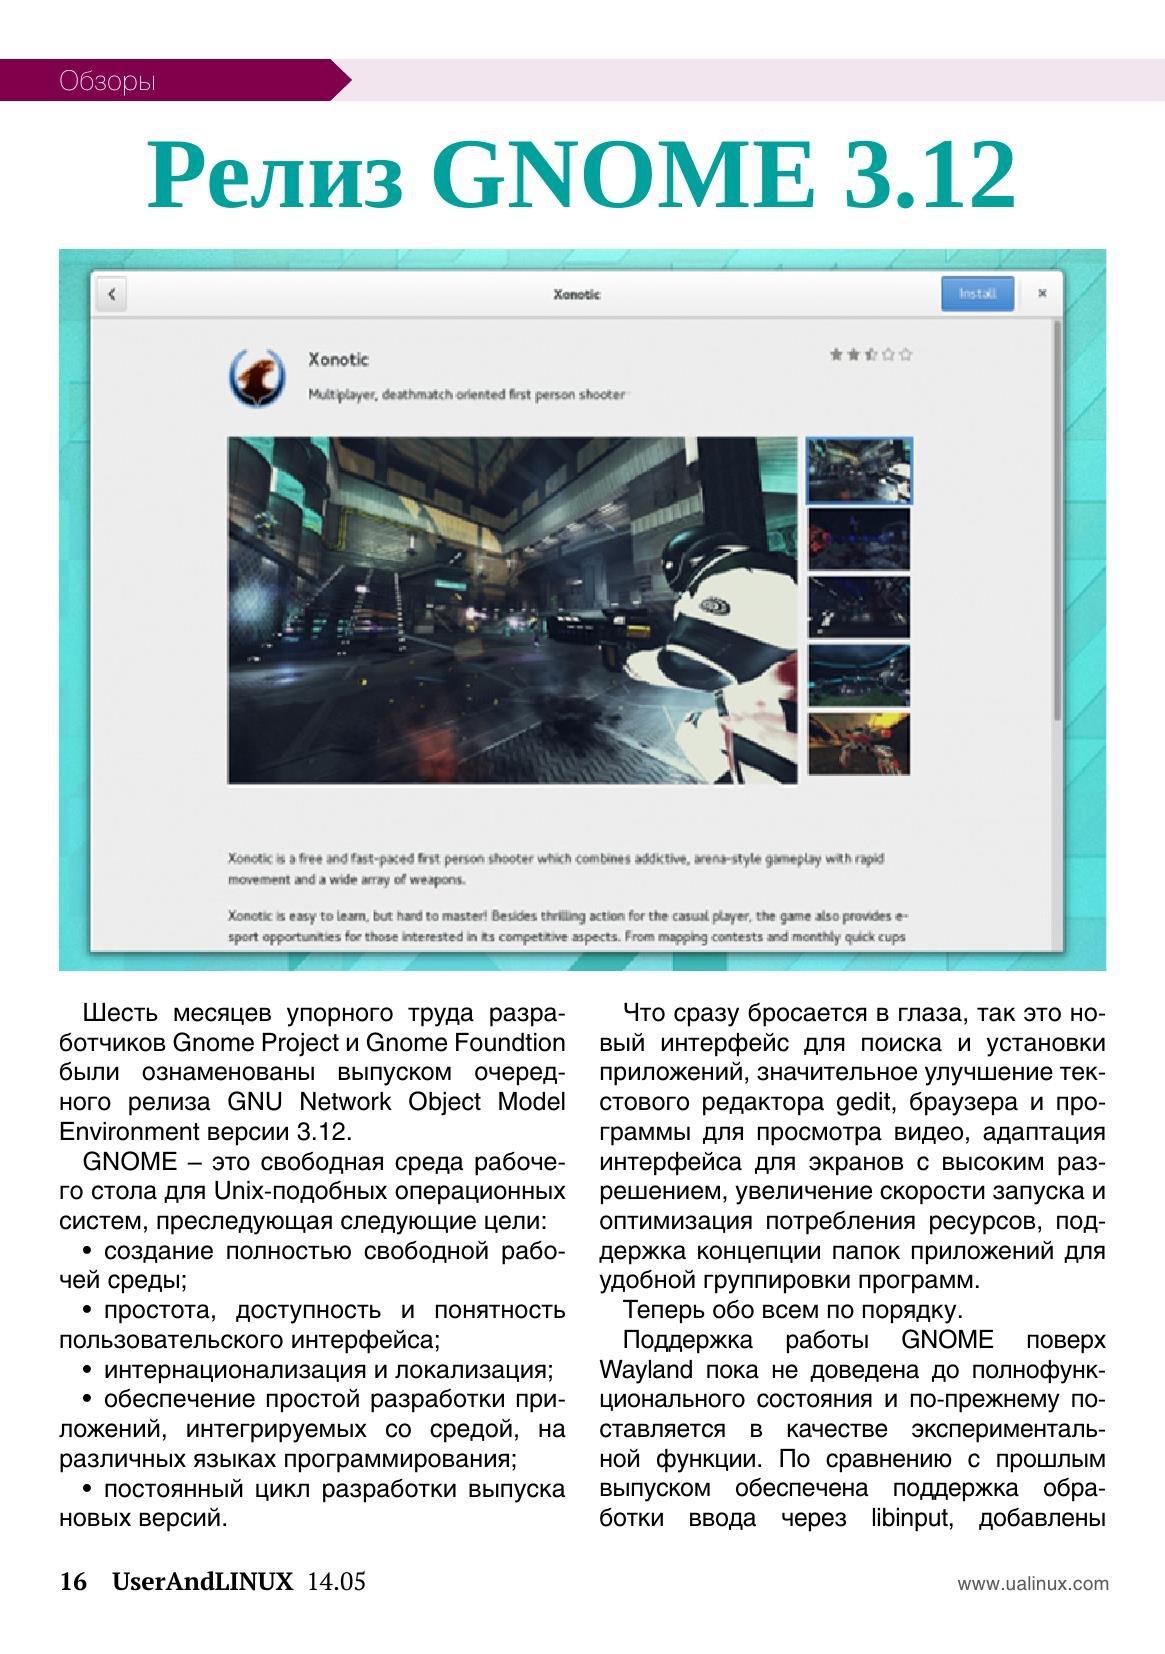 http://i6.imageban.ru/out/2014/05/01/ce51c20197e0d3e808244f39af9419f9.jpg